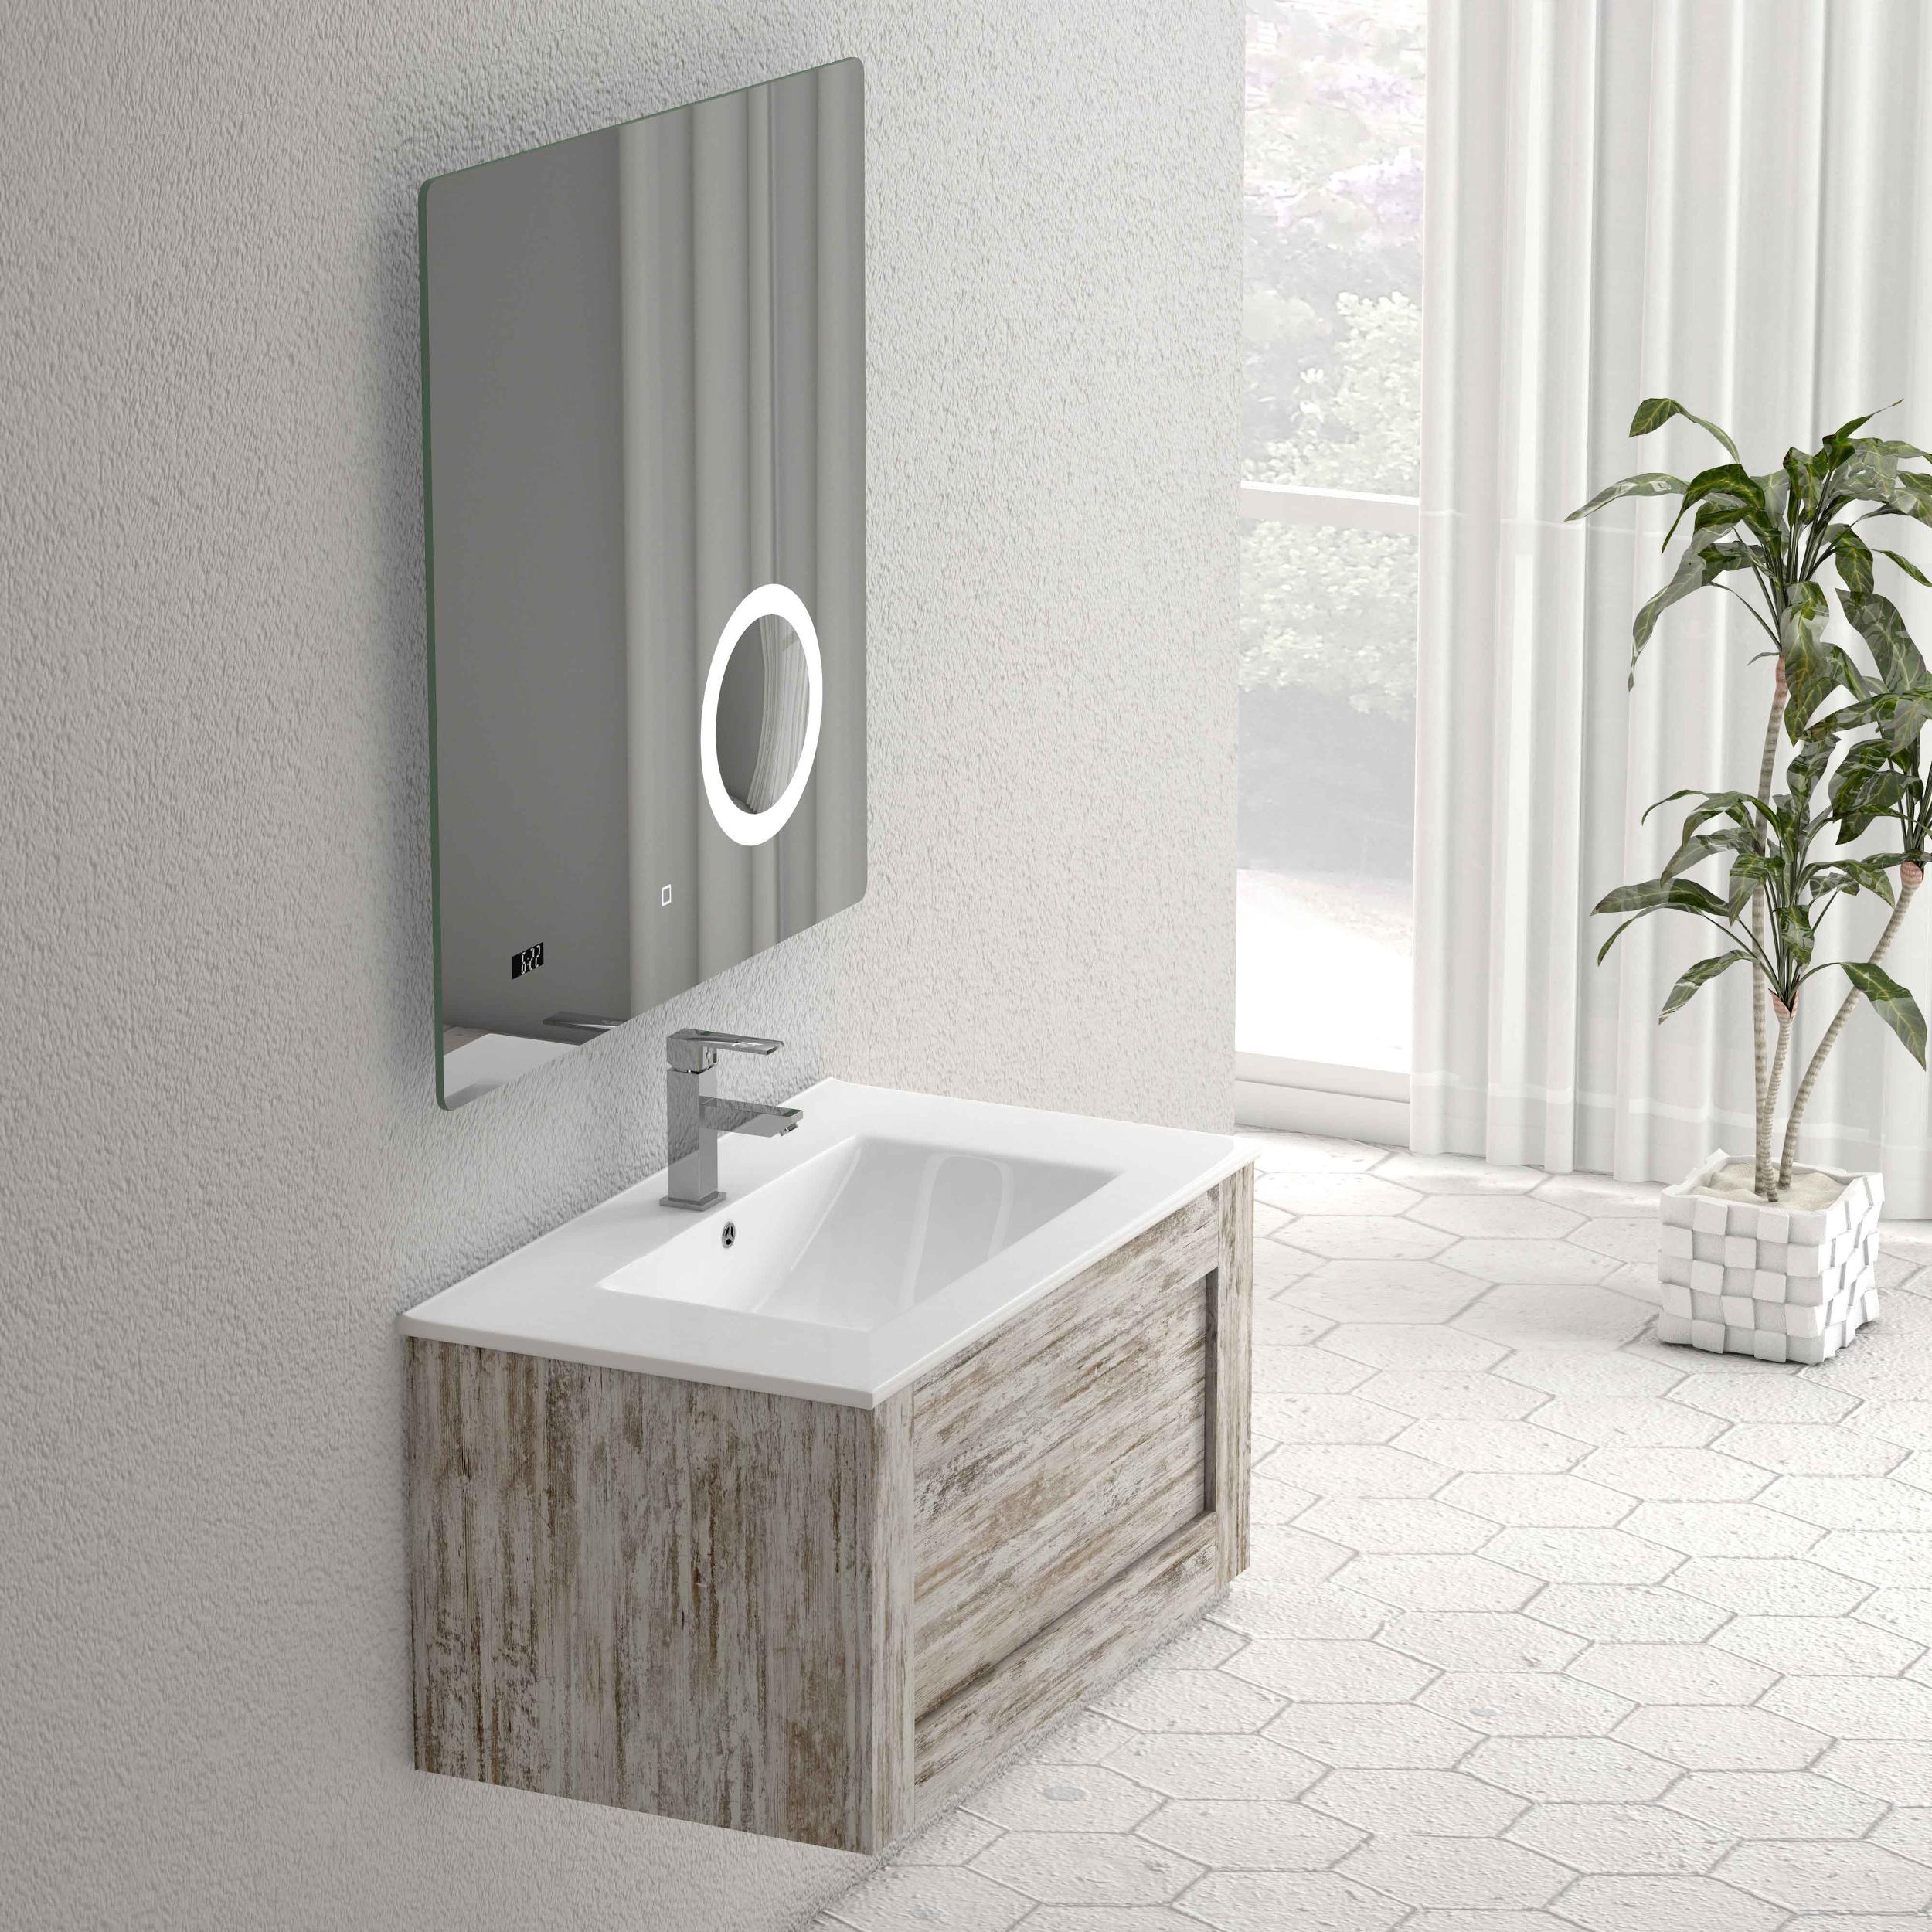 Three Hole Kitchen Faucets Eviva Capri Vintage 32 Quot Wall Mount Bathroom Vanity Decors Us